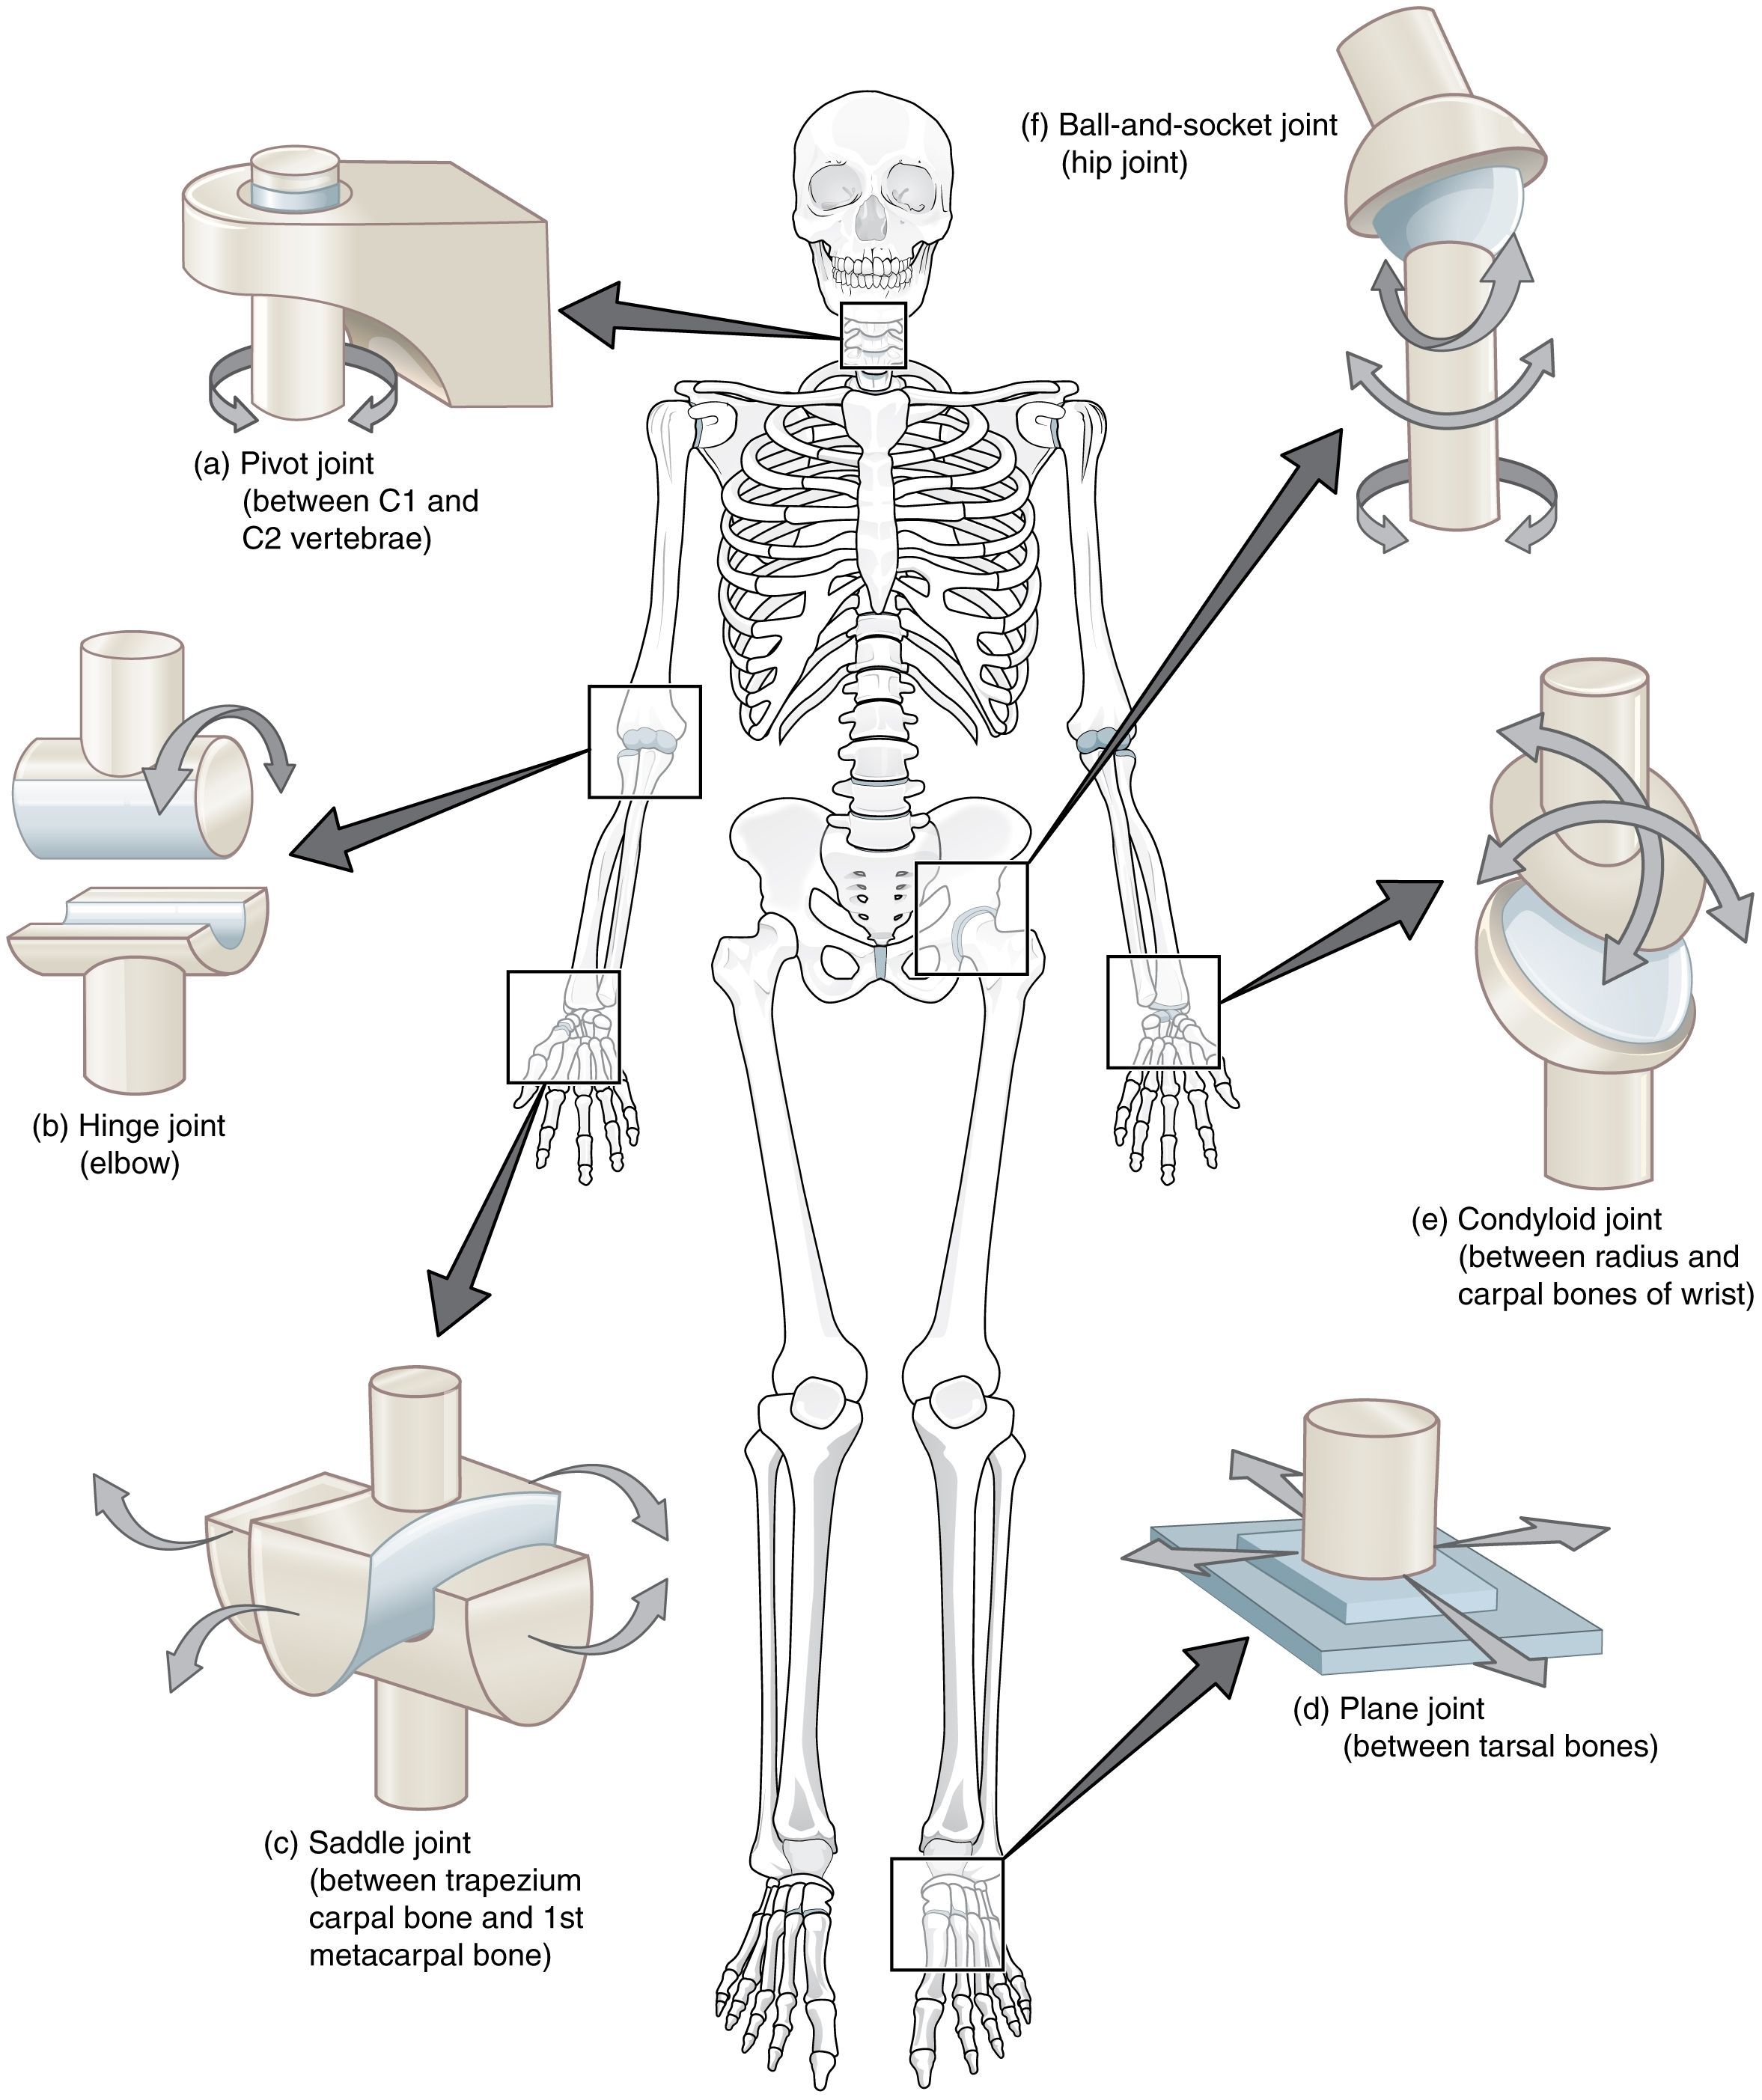 Human joint function diagram www.anatomynote.com | Human Body ...